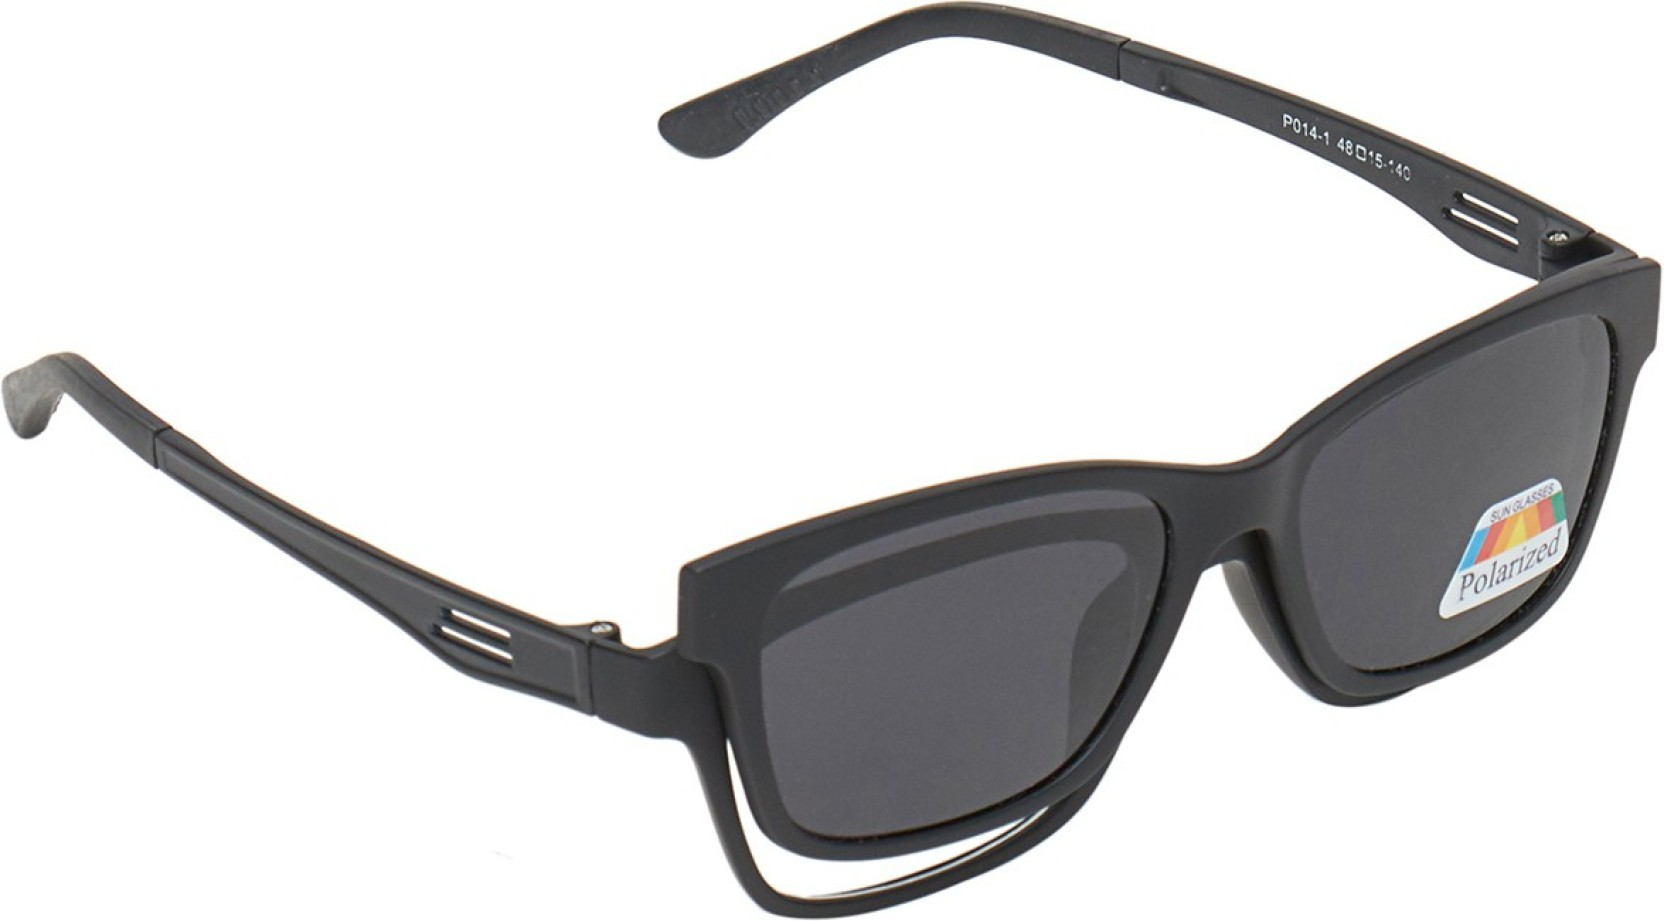 5948cb2e0912 First Copy Of Sunglasses India Men